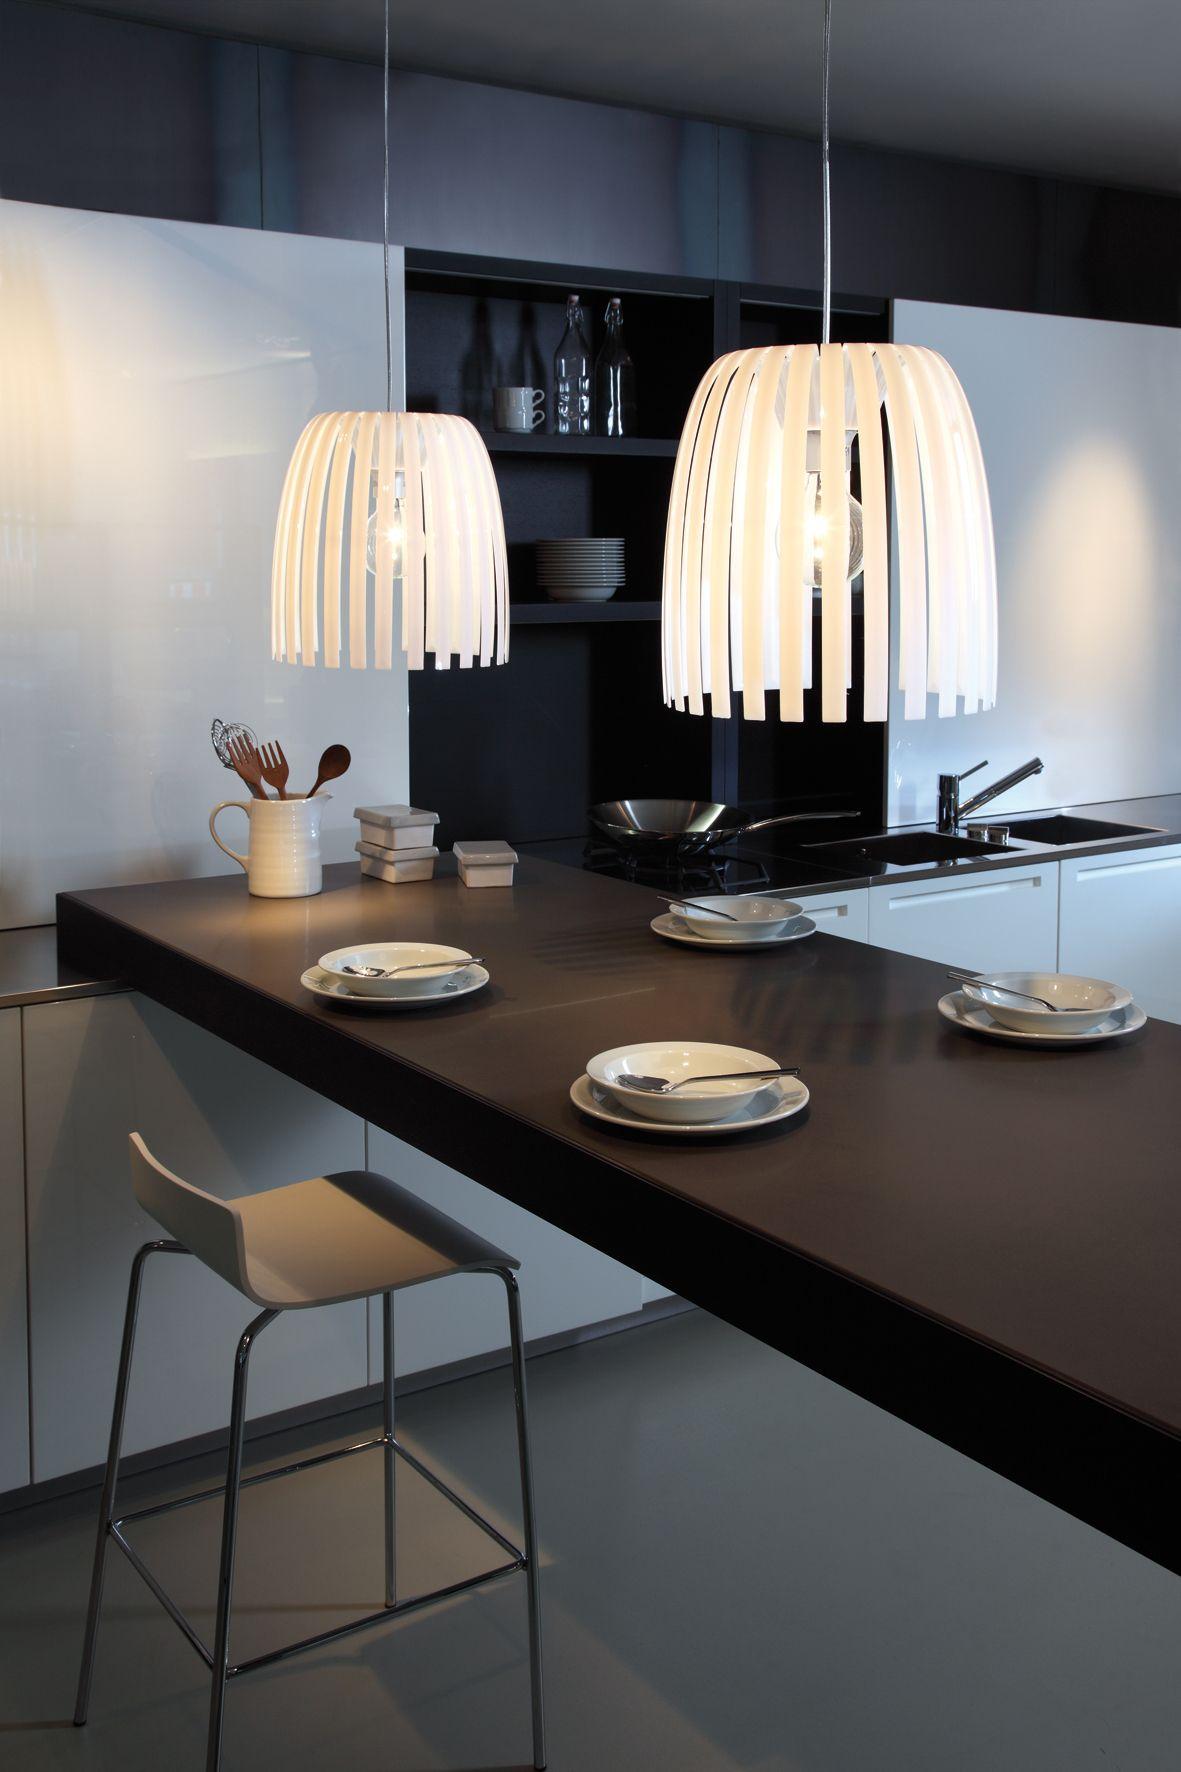 Exklusive Leuchte Lampen Design Ideen Top Lampe Josephine Lampen Designer Koziol Pendel Esstisch Ideen Pendelleucht In 2020 Home Decor White Pendant Light Lamp